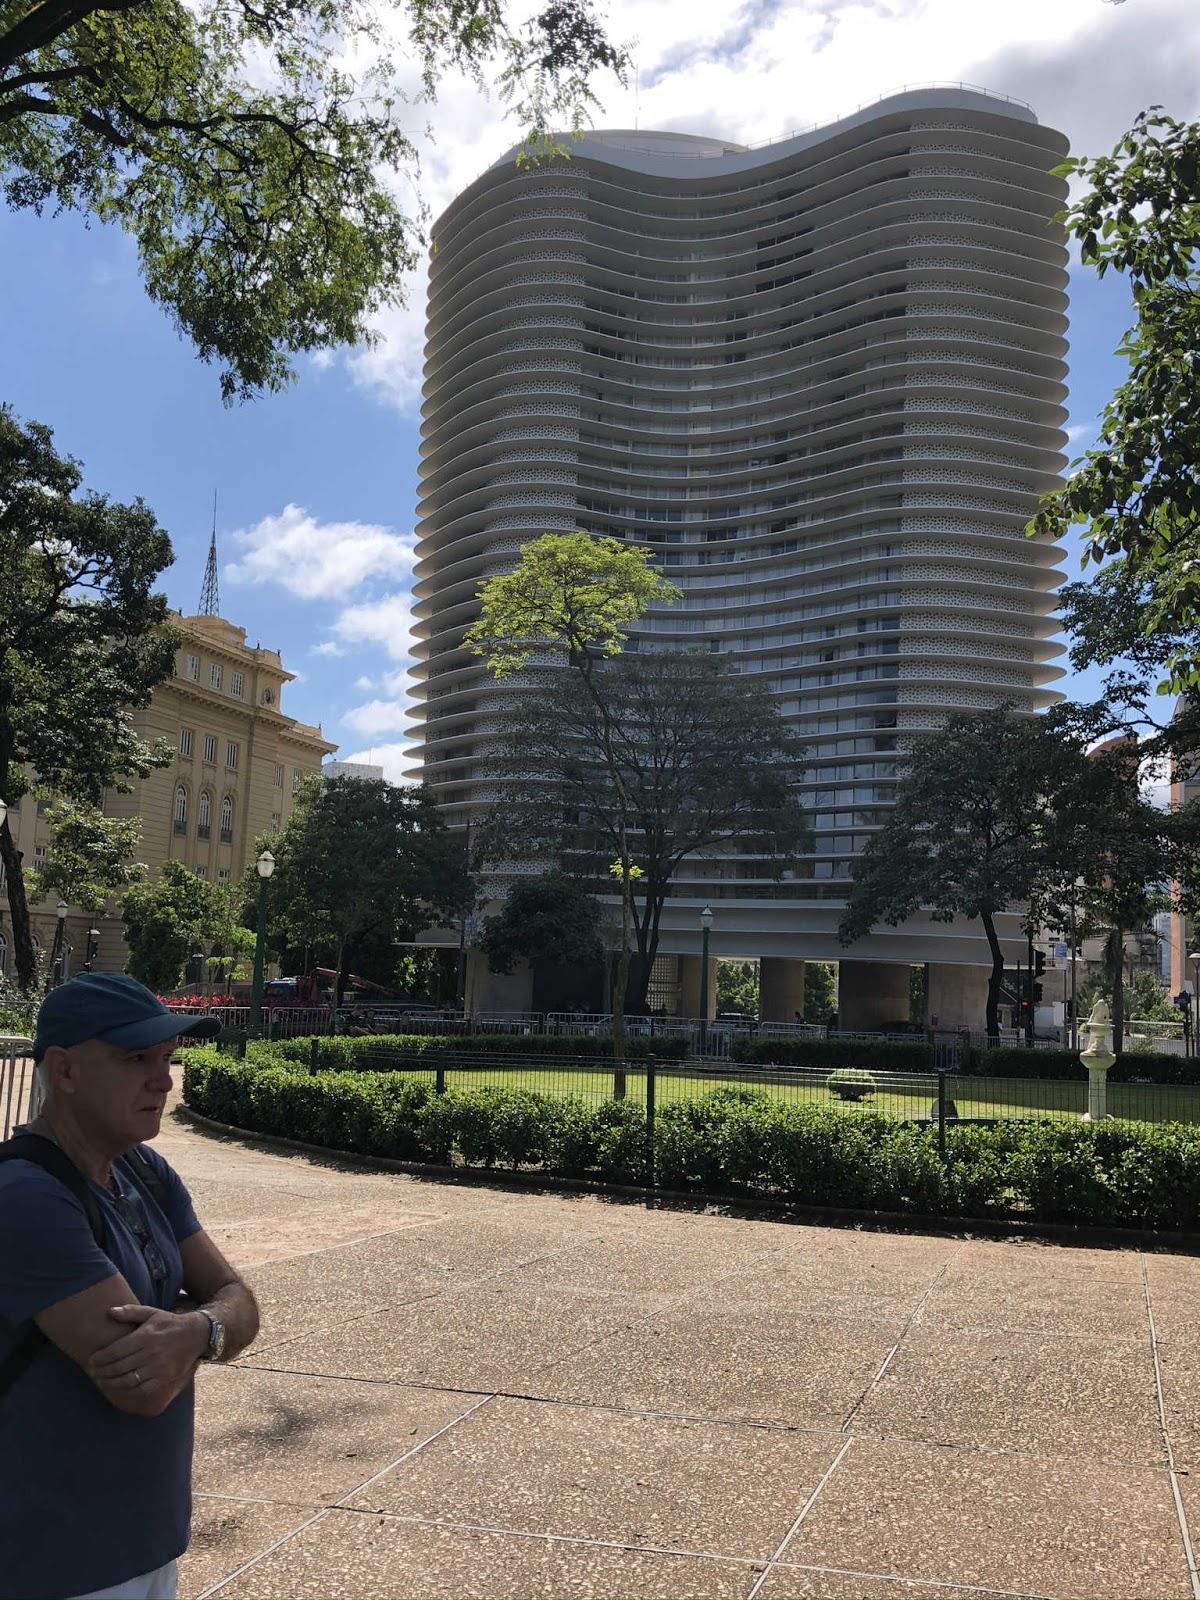 Edifício Niemeyer  - Belo Horizonte